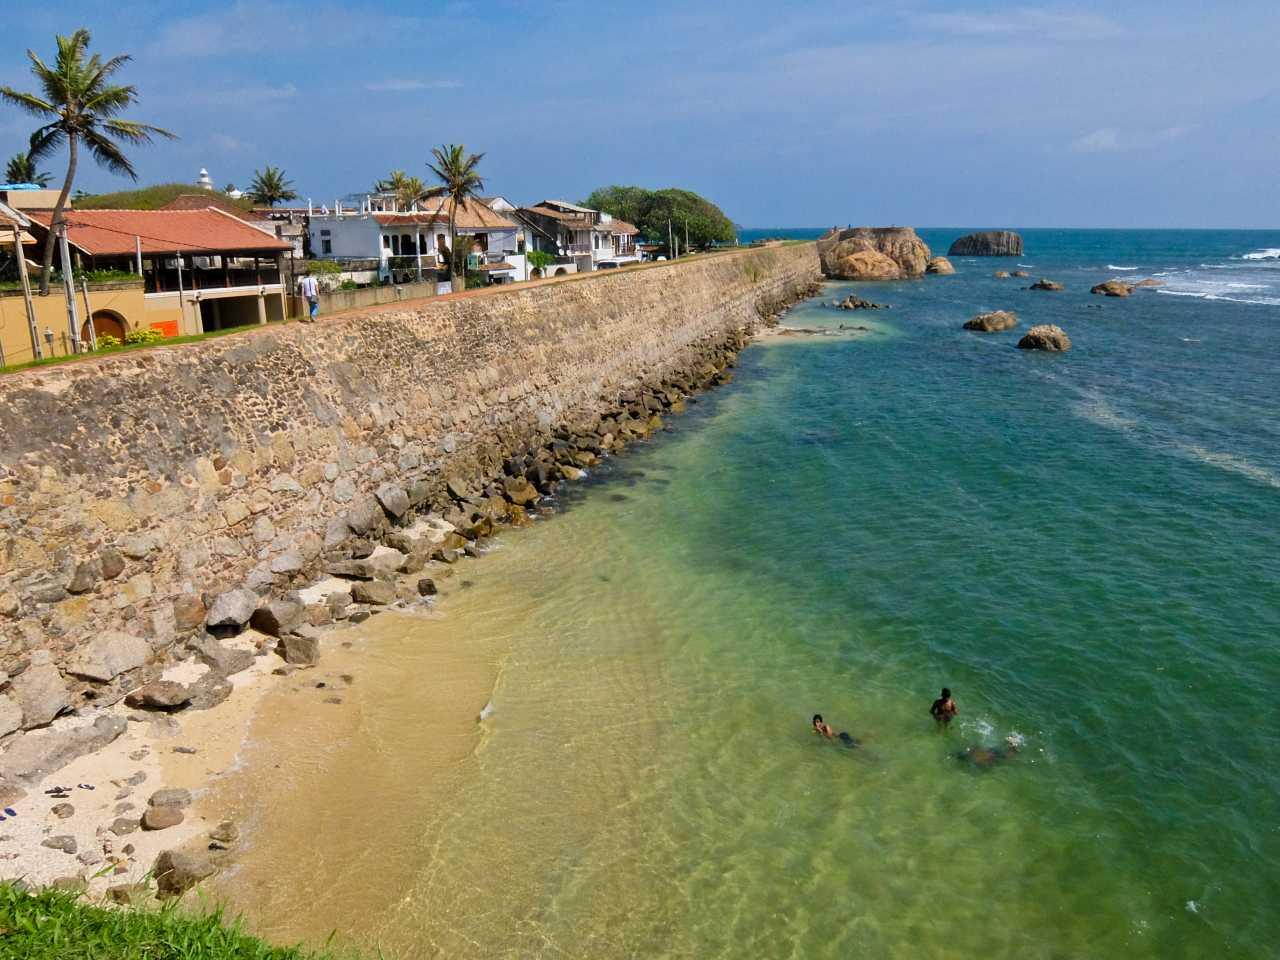 Sri Lanka road trip - Galle Ramparts